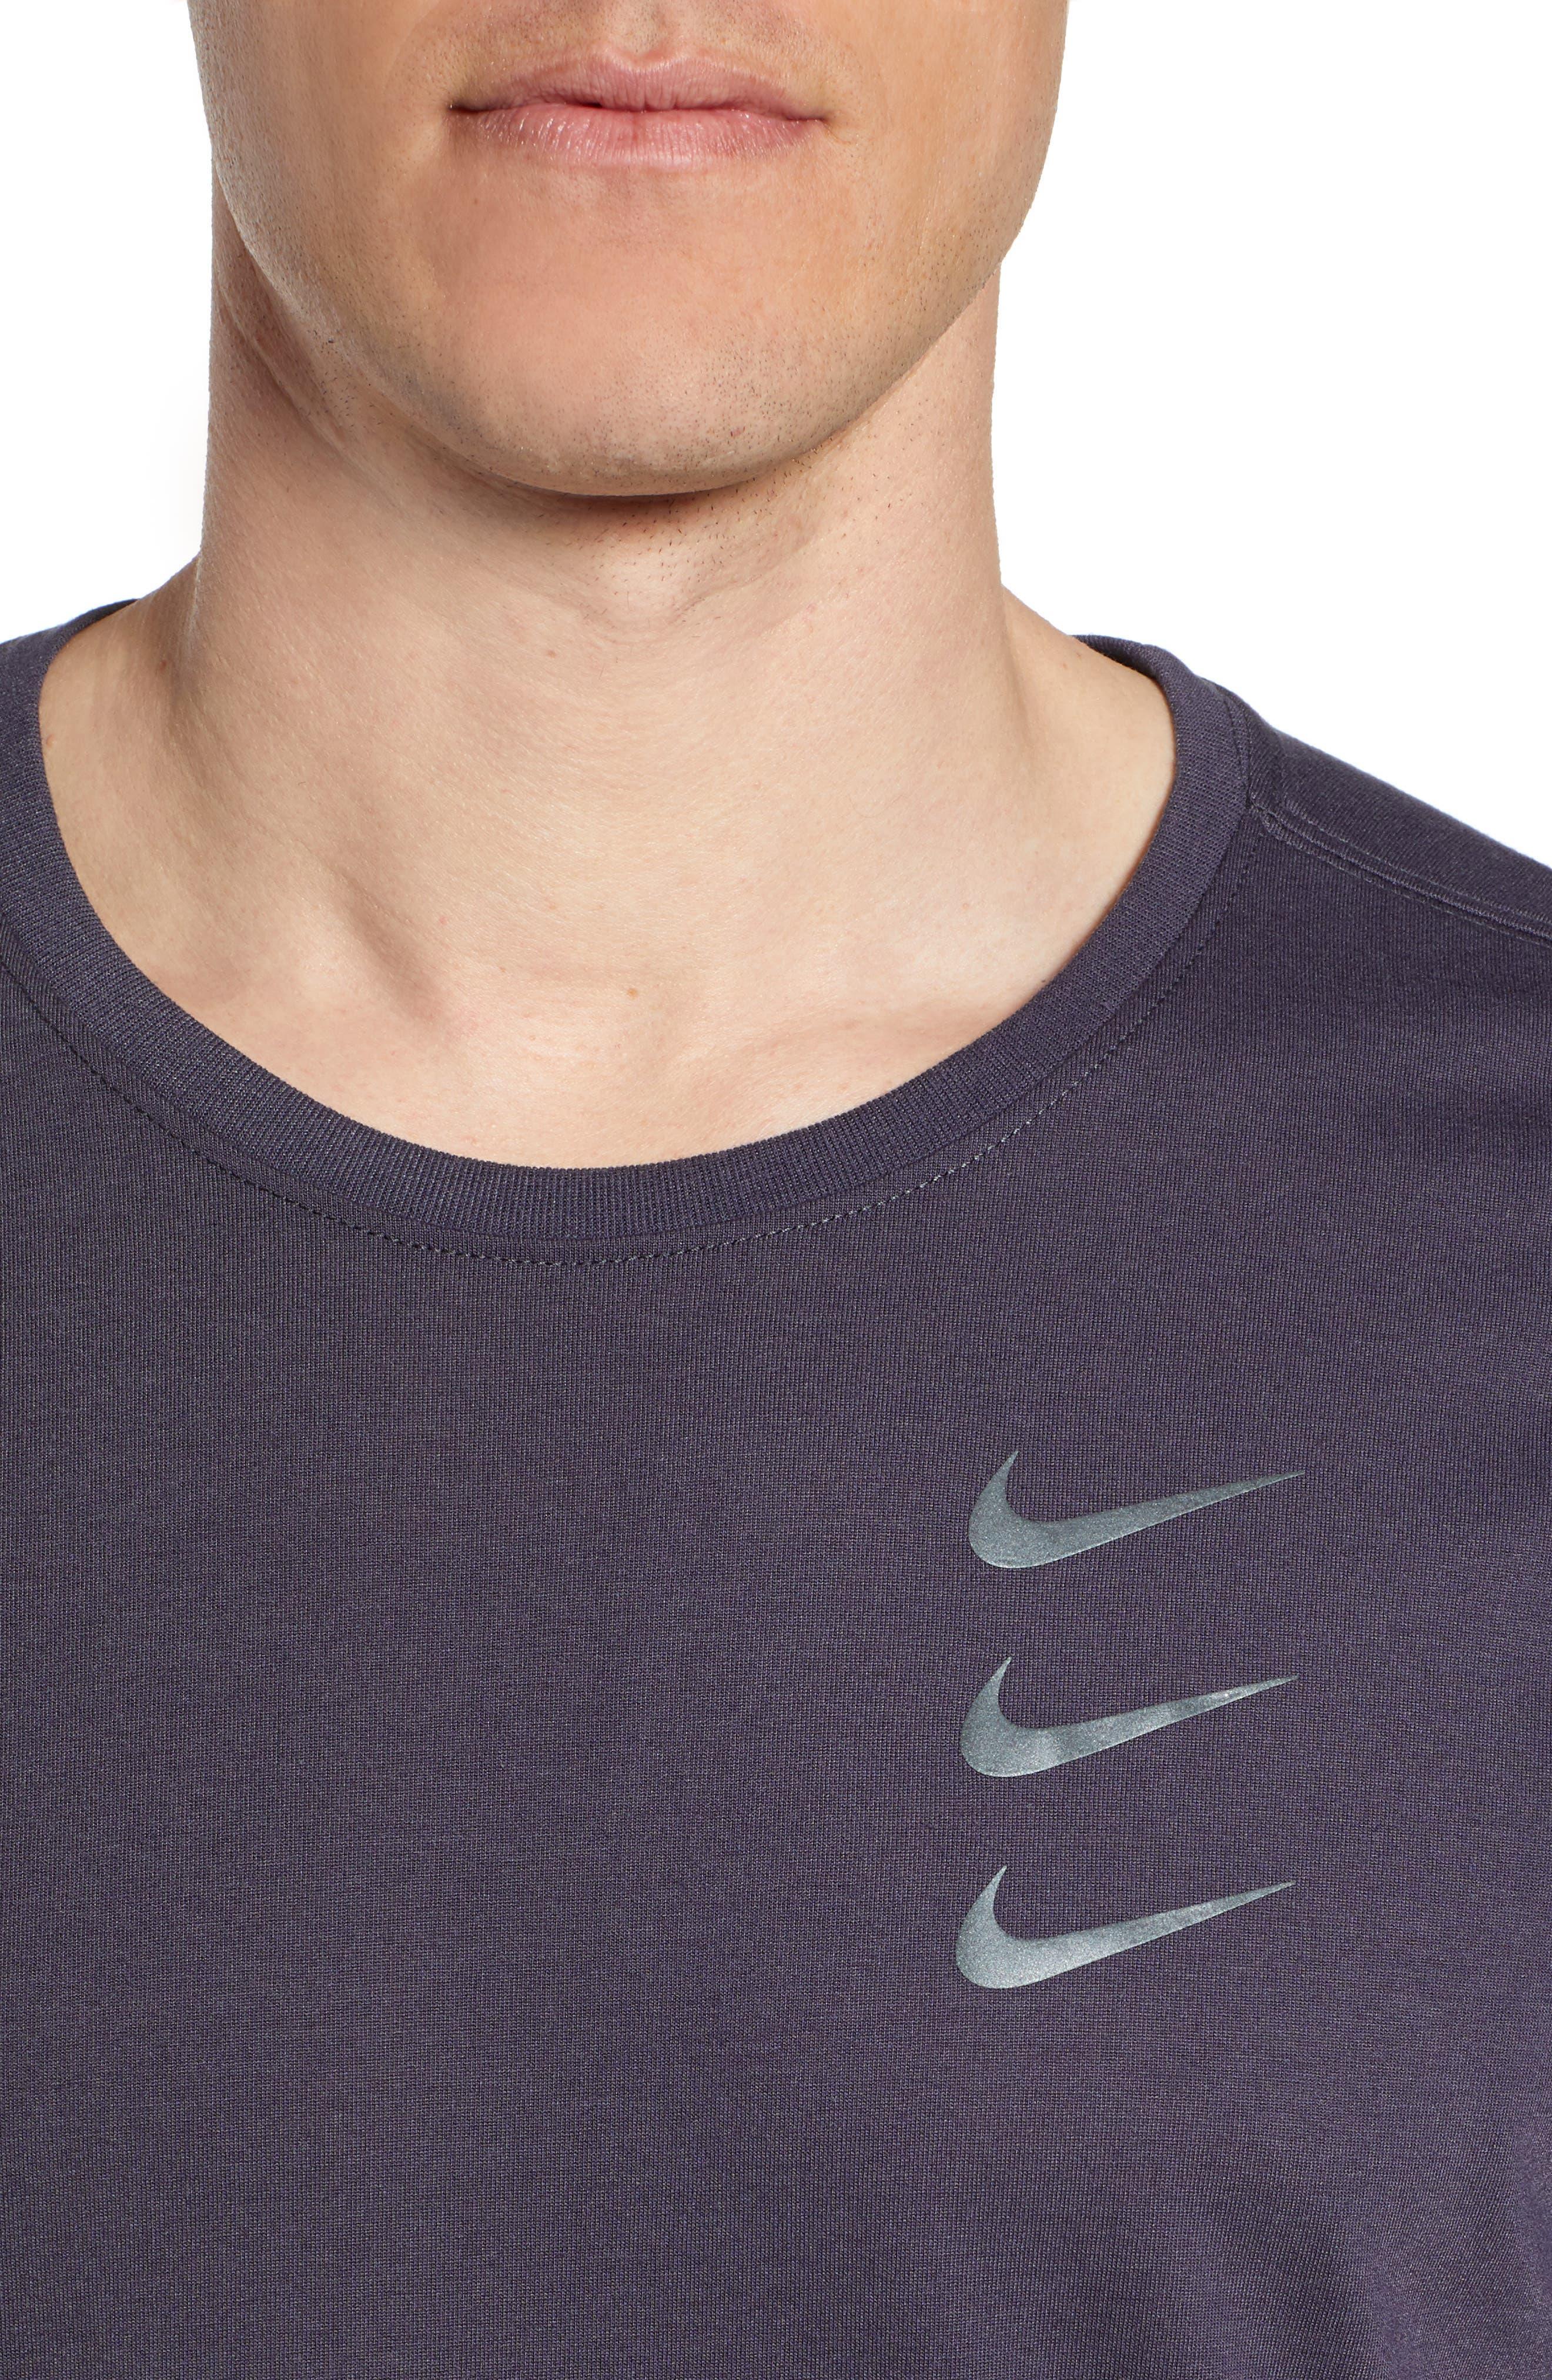 Dry Running Division T-Shirt,                             Alternate thumbnail 4, color,                             GRIDIRON/ GUNSMOKE